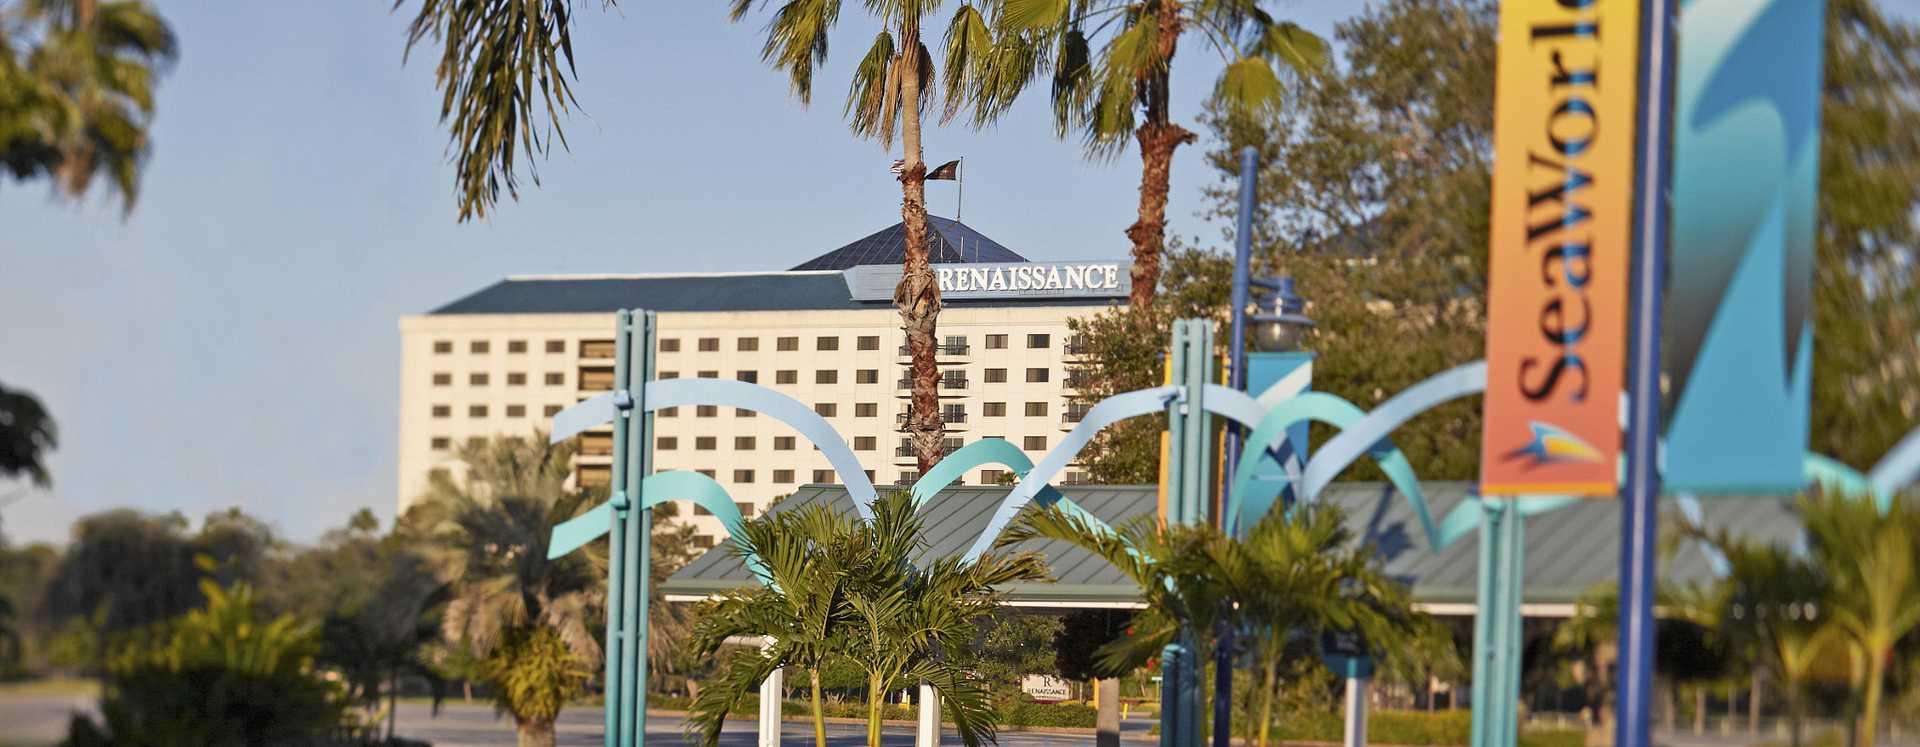 Renaissance Orlando at SeaWorld hotel exterior